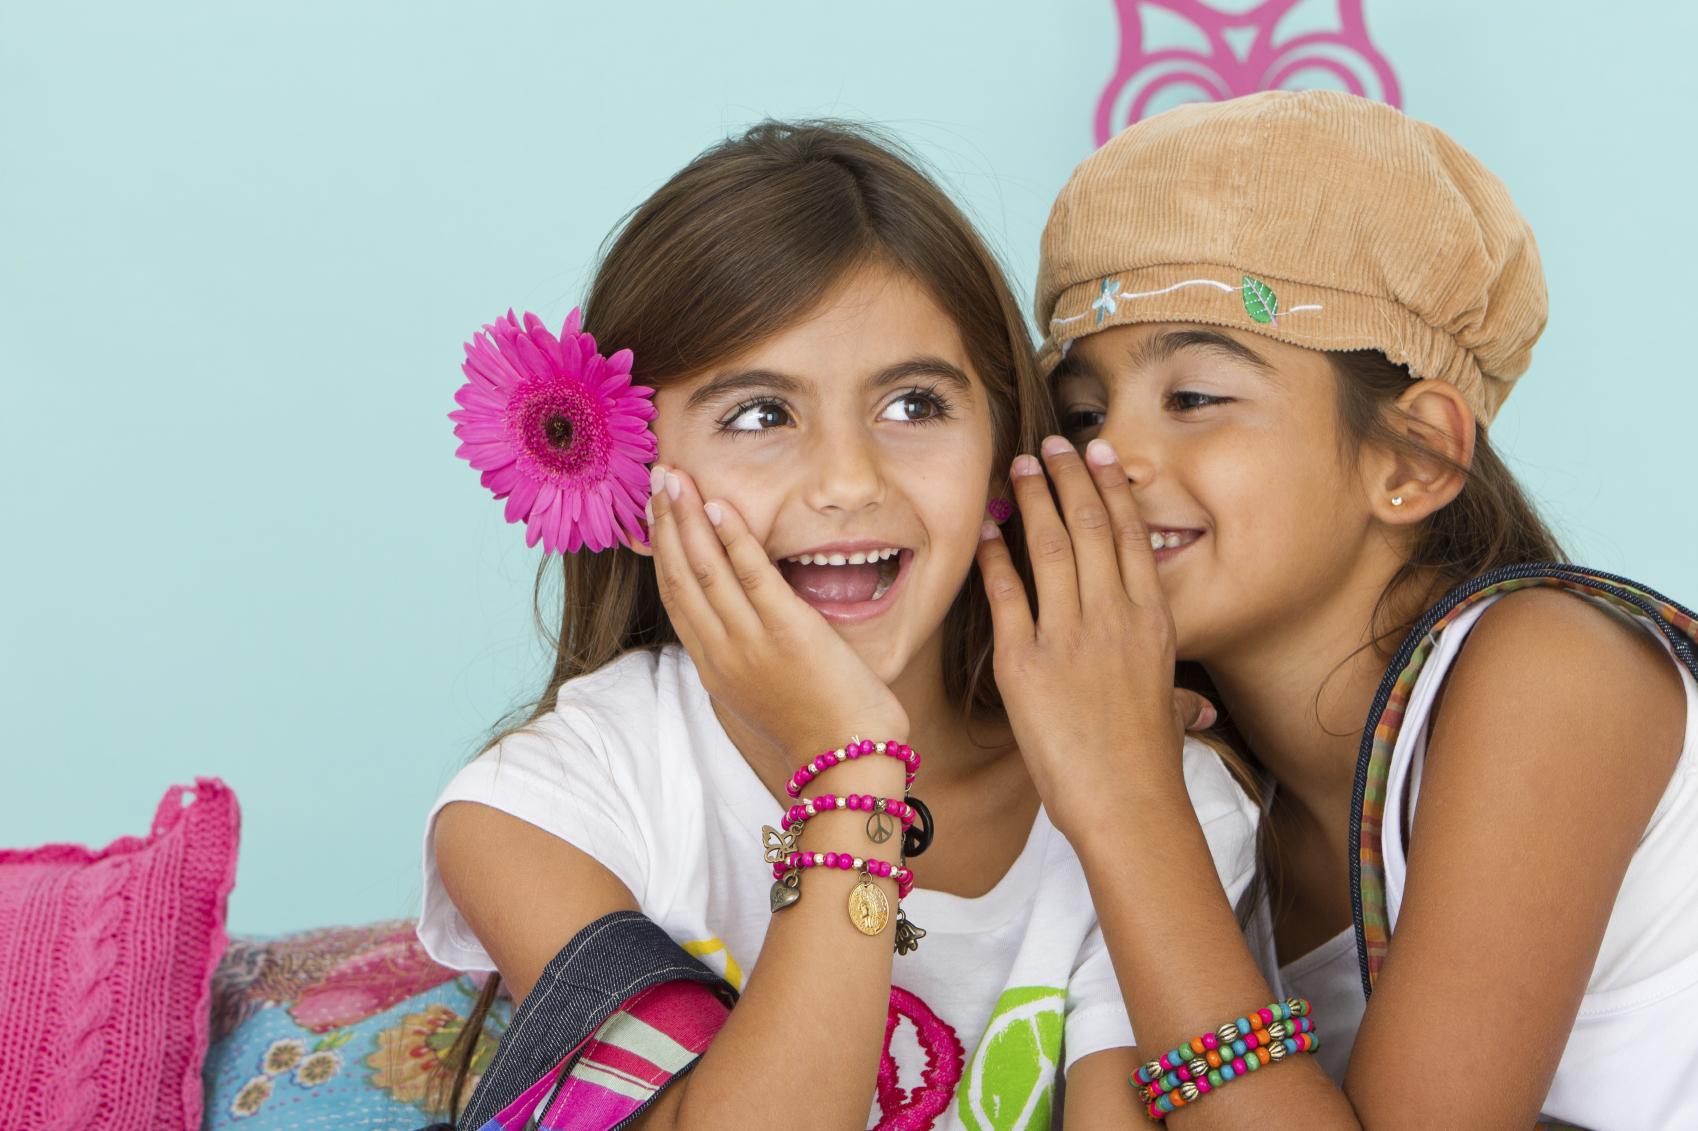 967aba44a05 Dé kinderschoenen outlet van Nederland - To Be Dressed